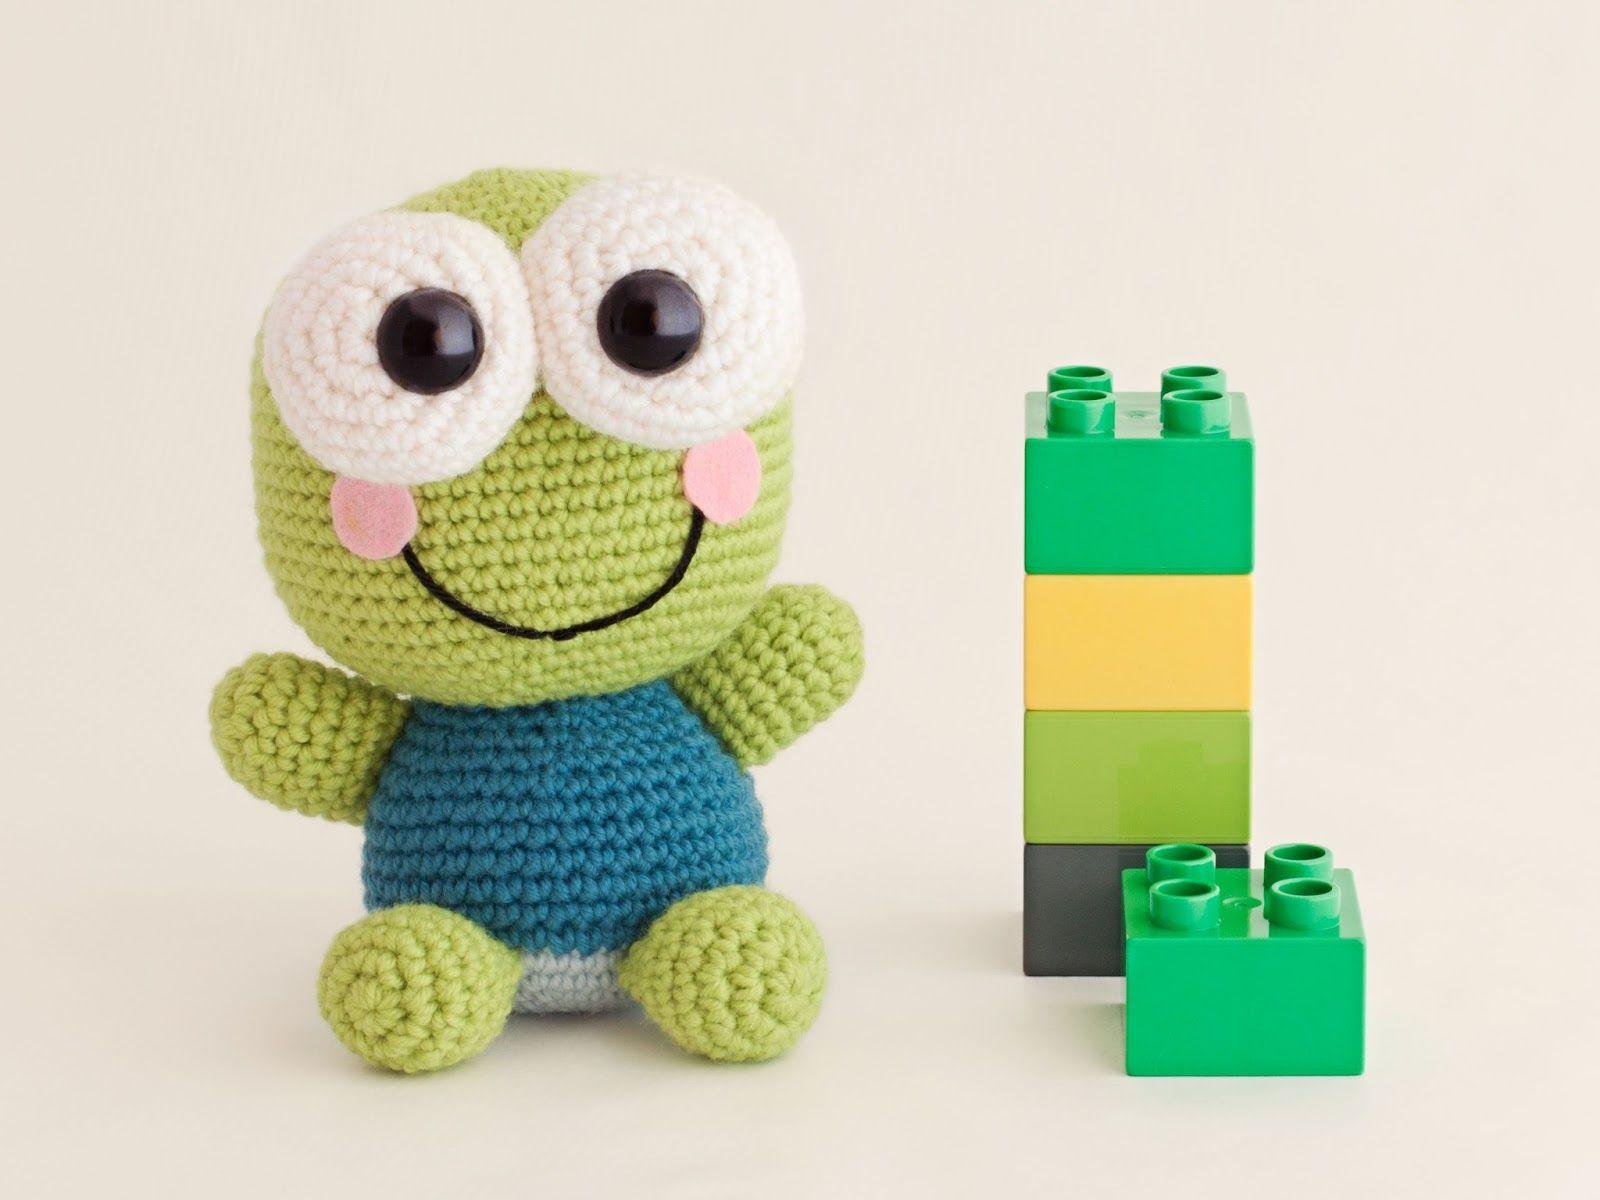 Amigurumi frog kerokeroppi free crochet pattern tutorial amigurumi frog kerokeroppi free crochet pattern tutorial bankloansurffo Gallery